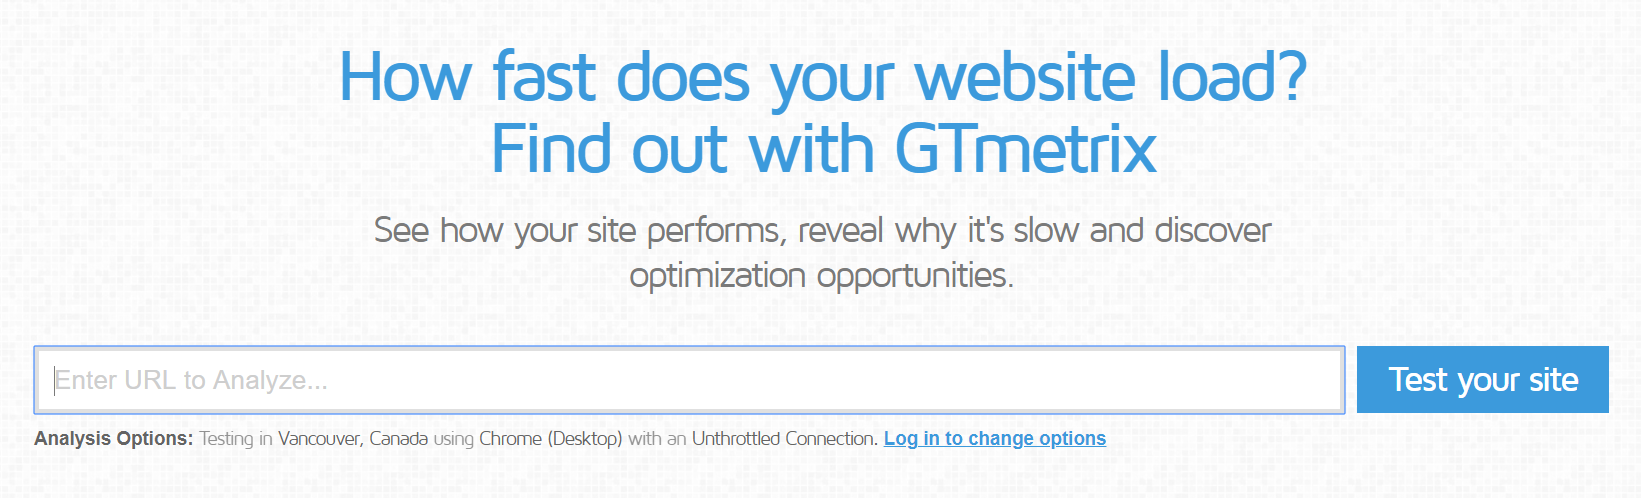 GTmetrix site performance tool